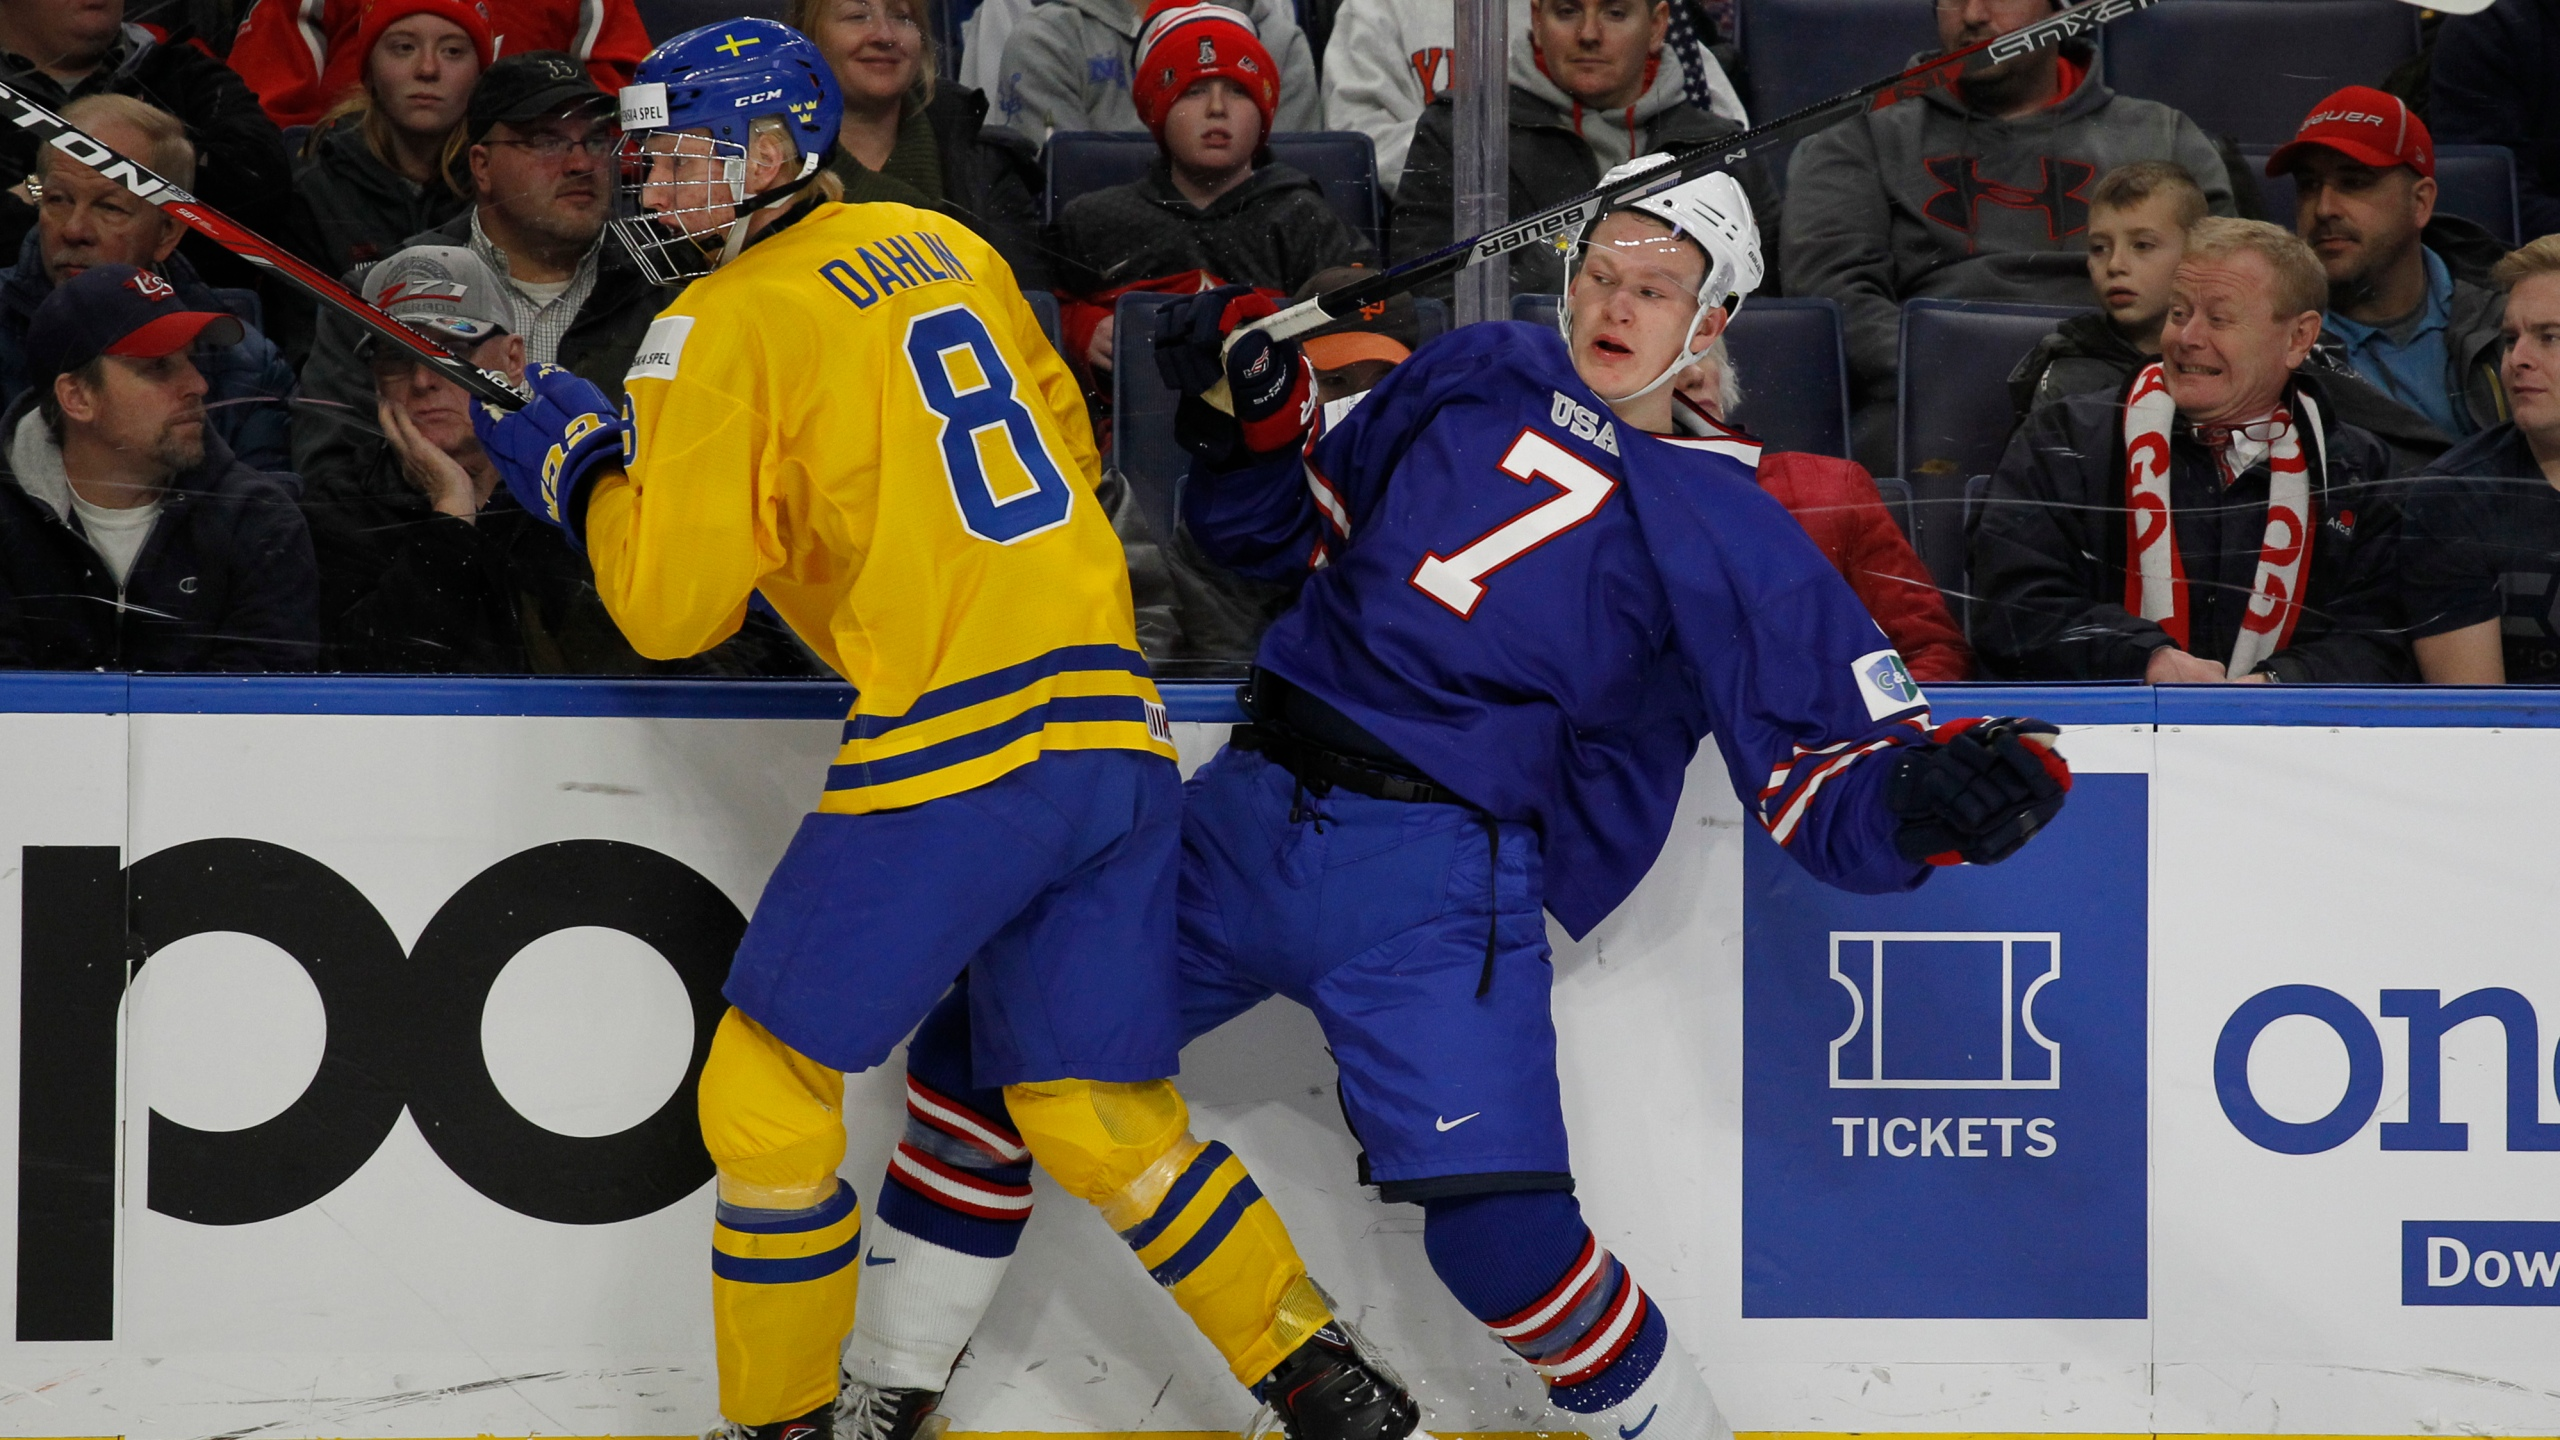 World Juniors Sweden United States Hockey_1529900190687